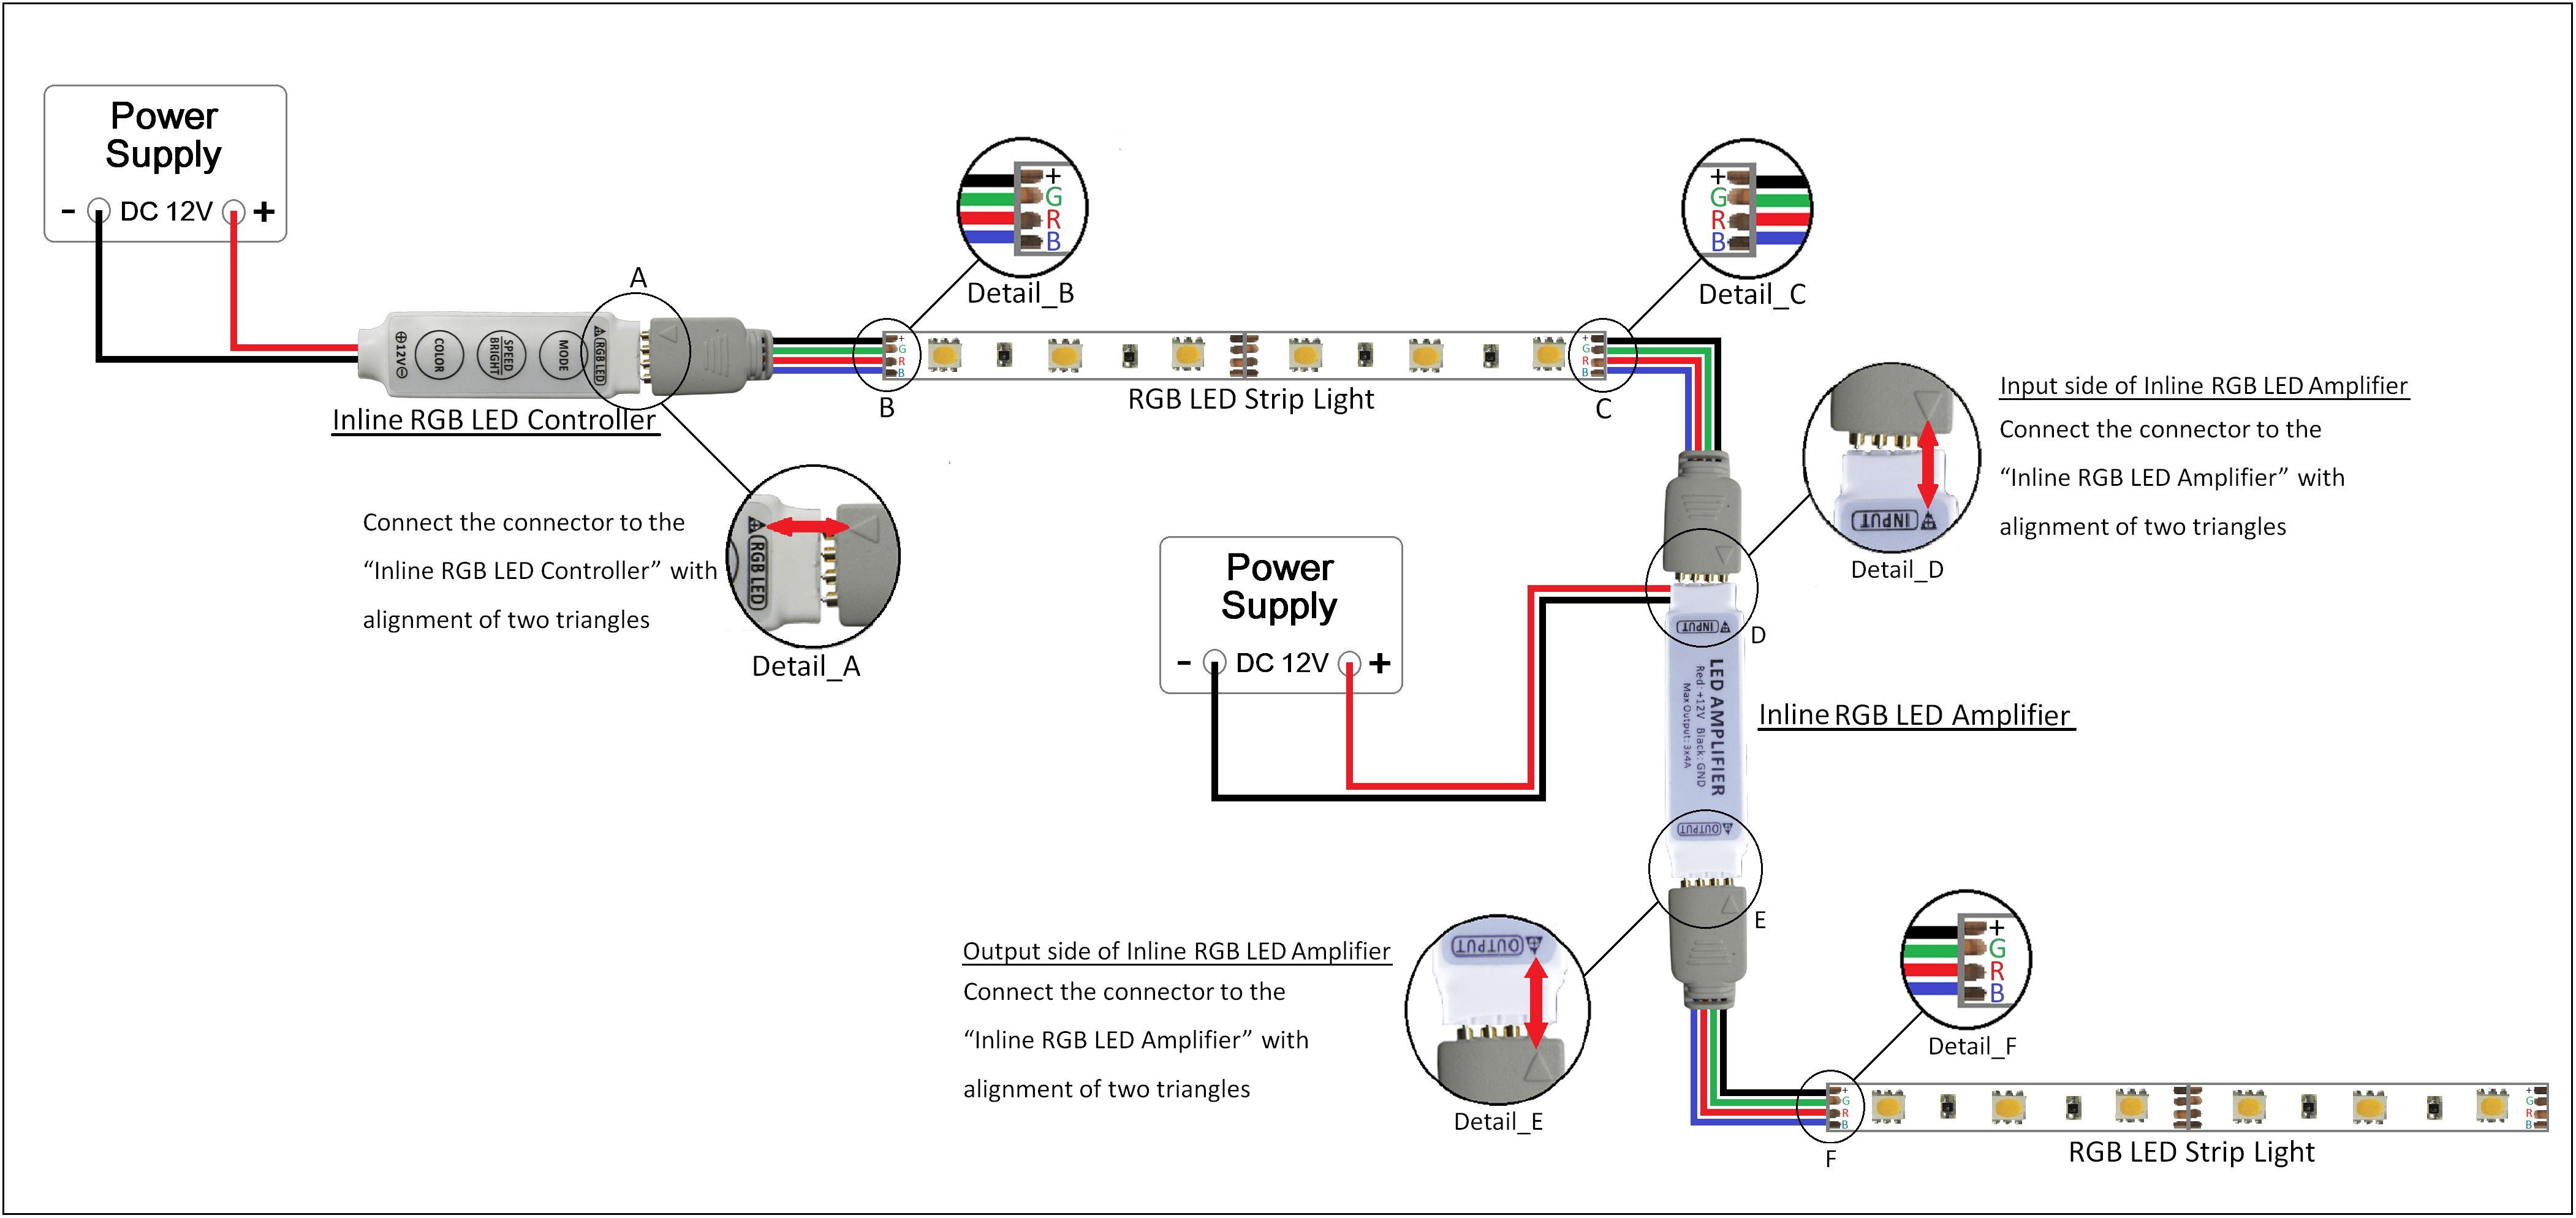 Semi Trailer Plug Wiring Diagram 7 Way - Wiring Diagram